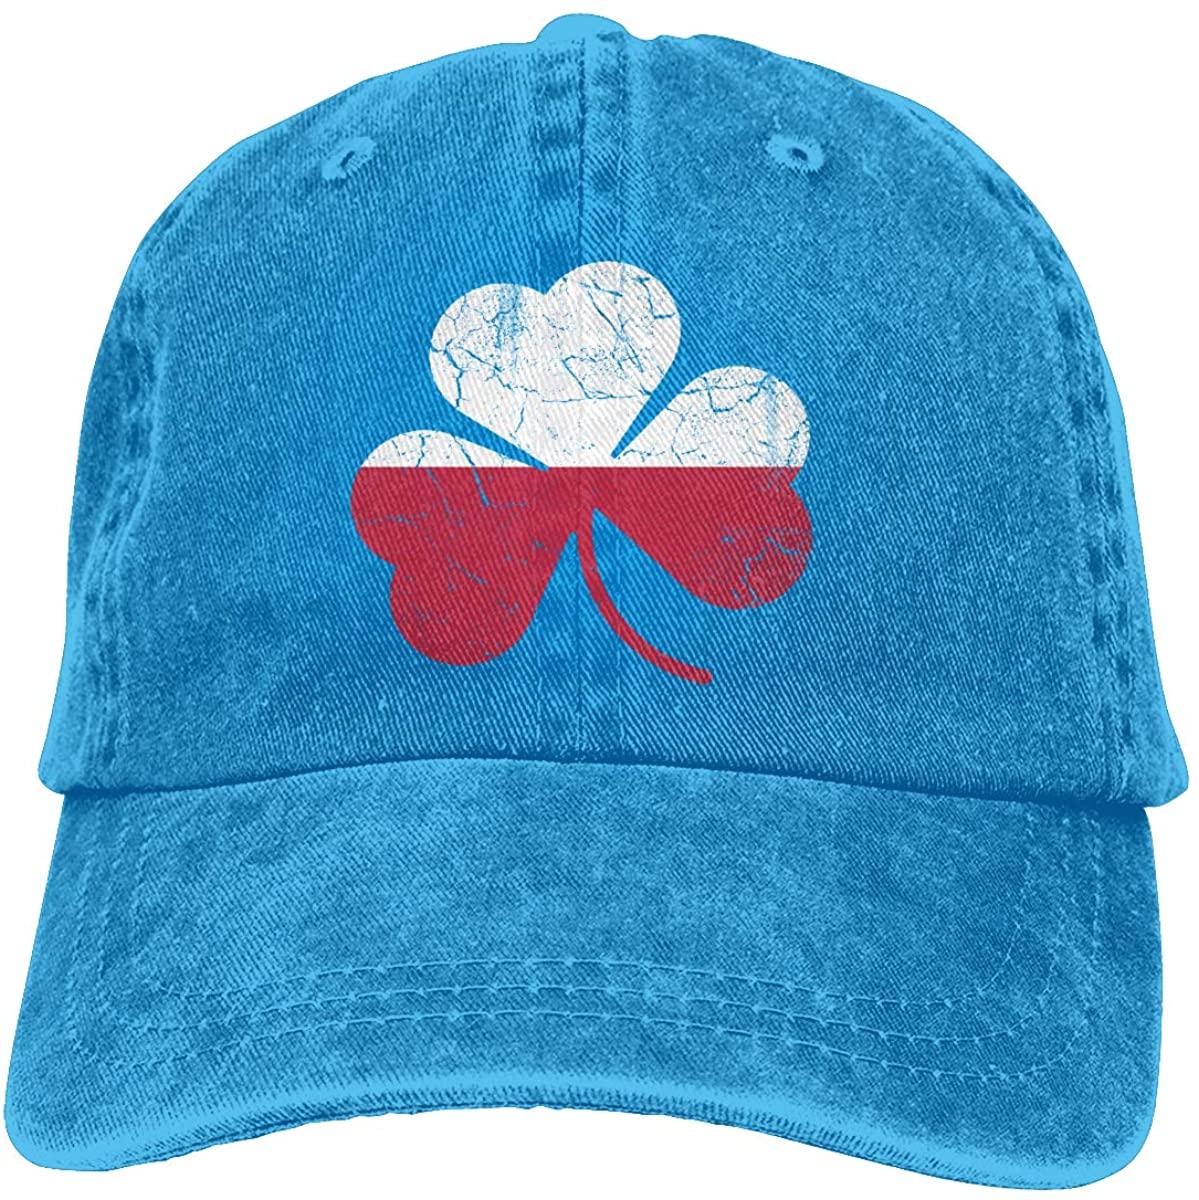 Vintage Irish Flag of Poland Shamrock Heritage Trend Printing Cowboy Hat Fashion Baseball Cap for Men and Women Black